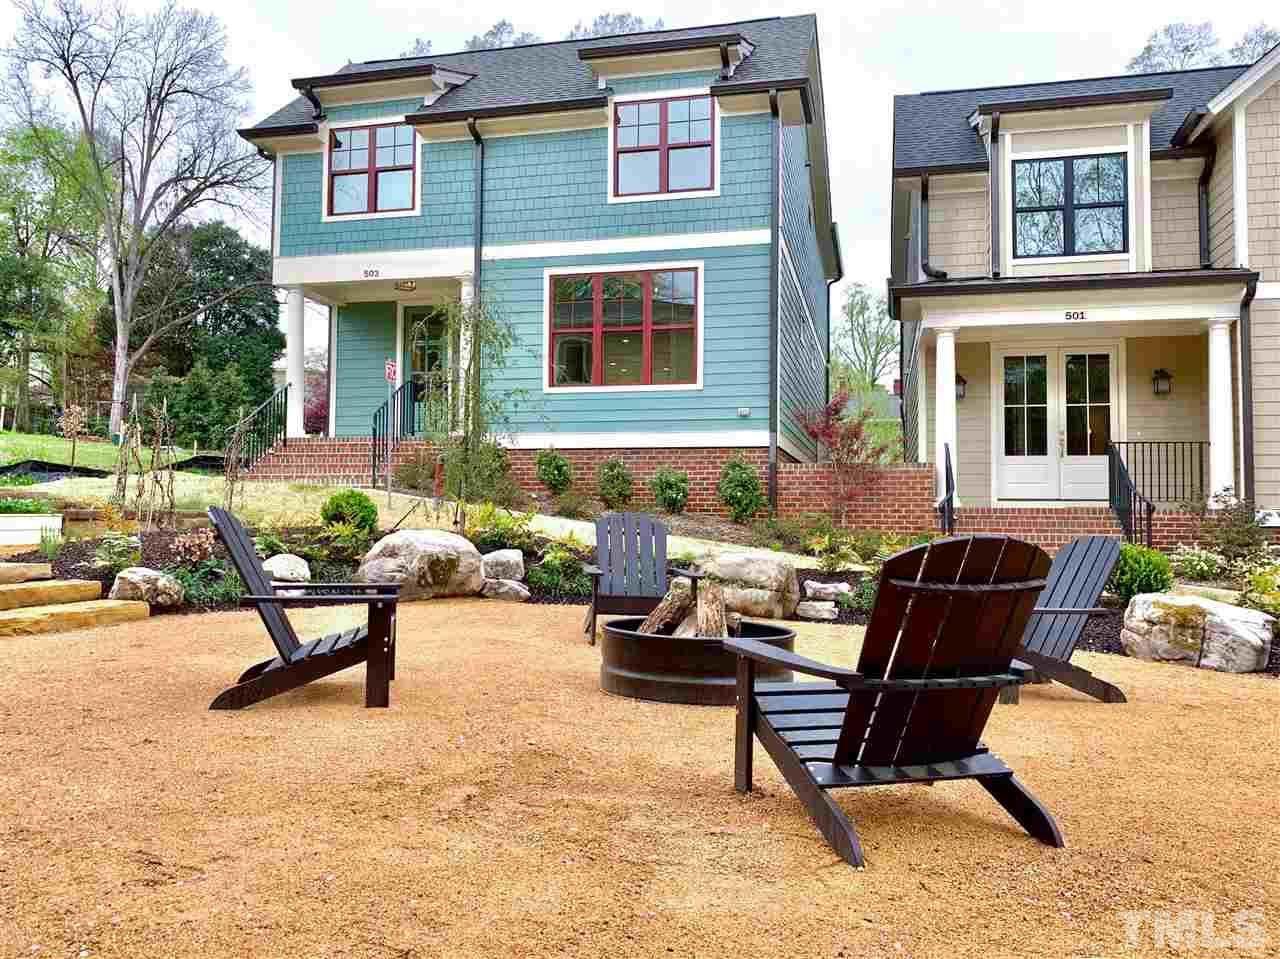 503 Hamilton Cottage Way - Photo 1